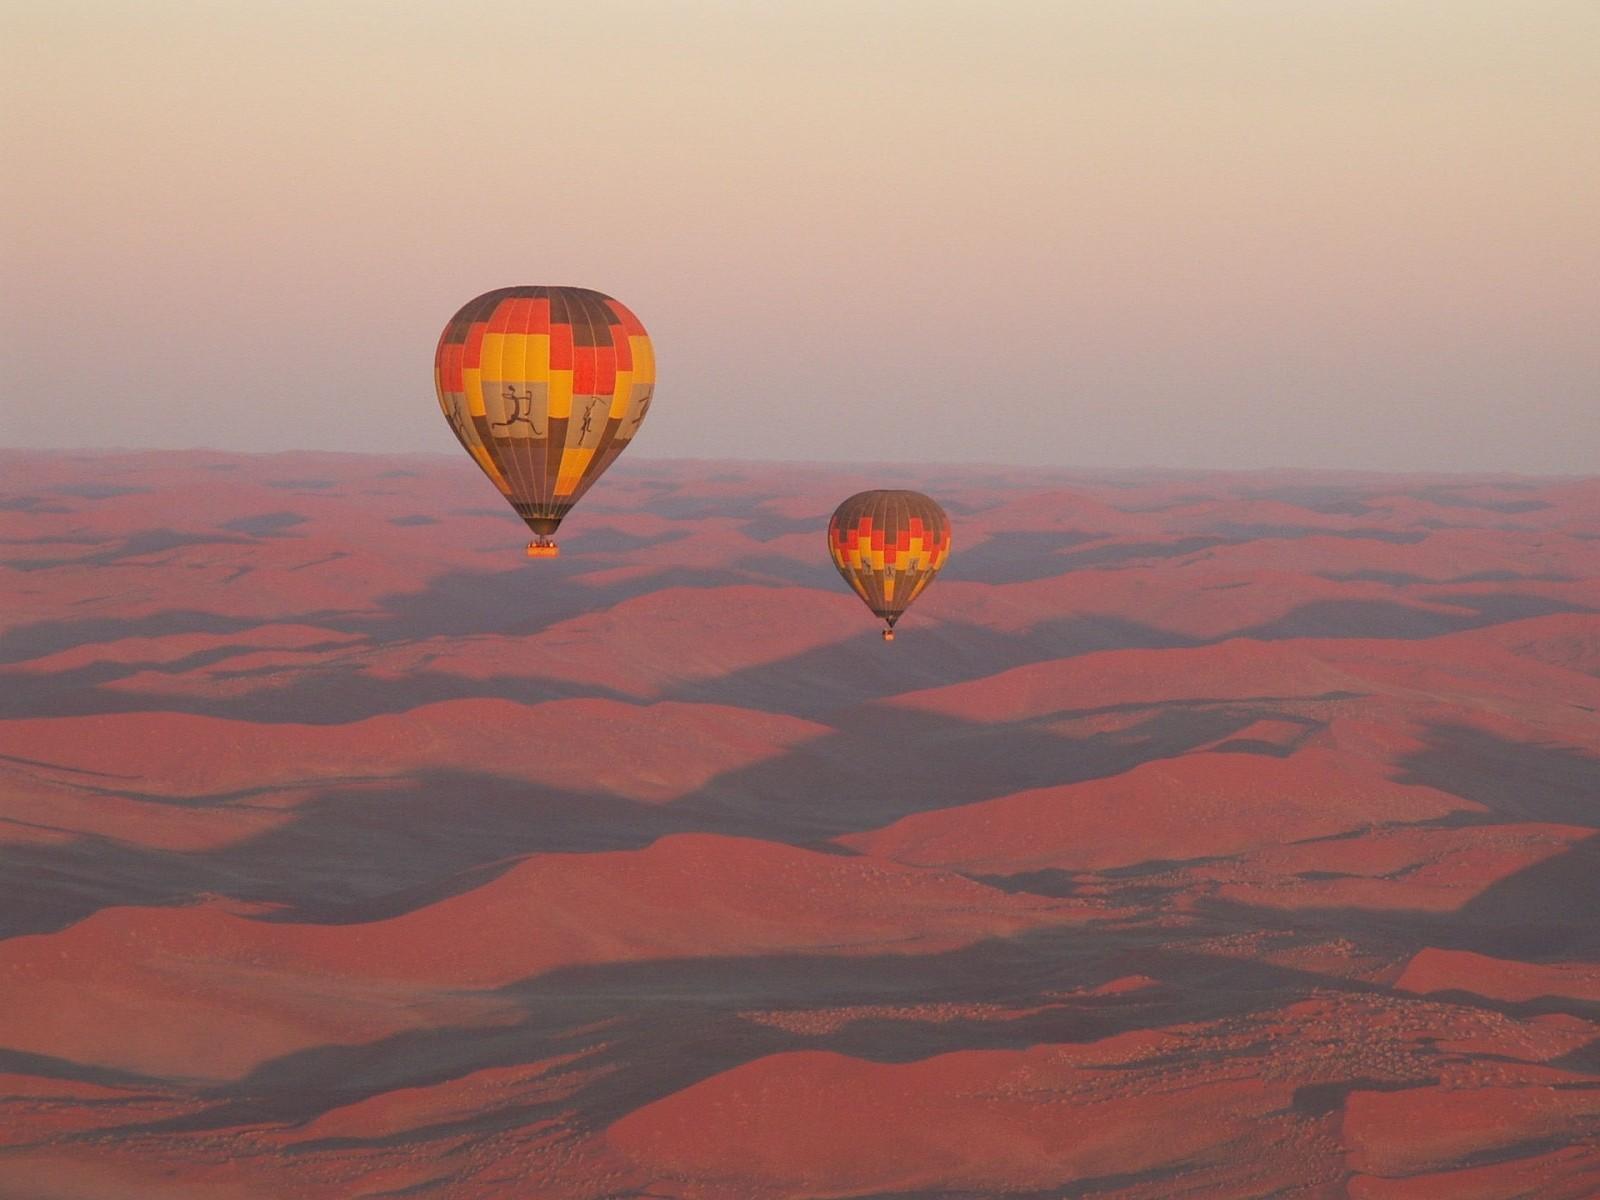 Sunrise-Balloon-Ride.jpg